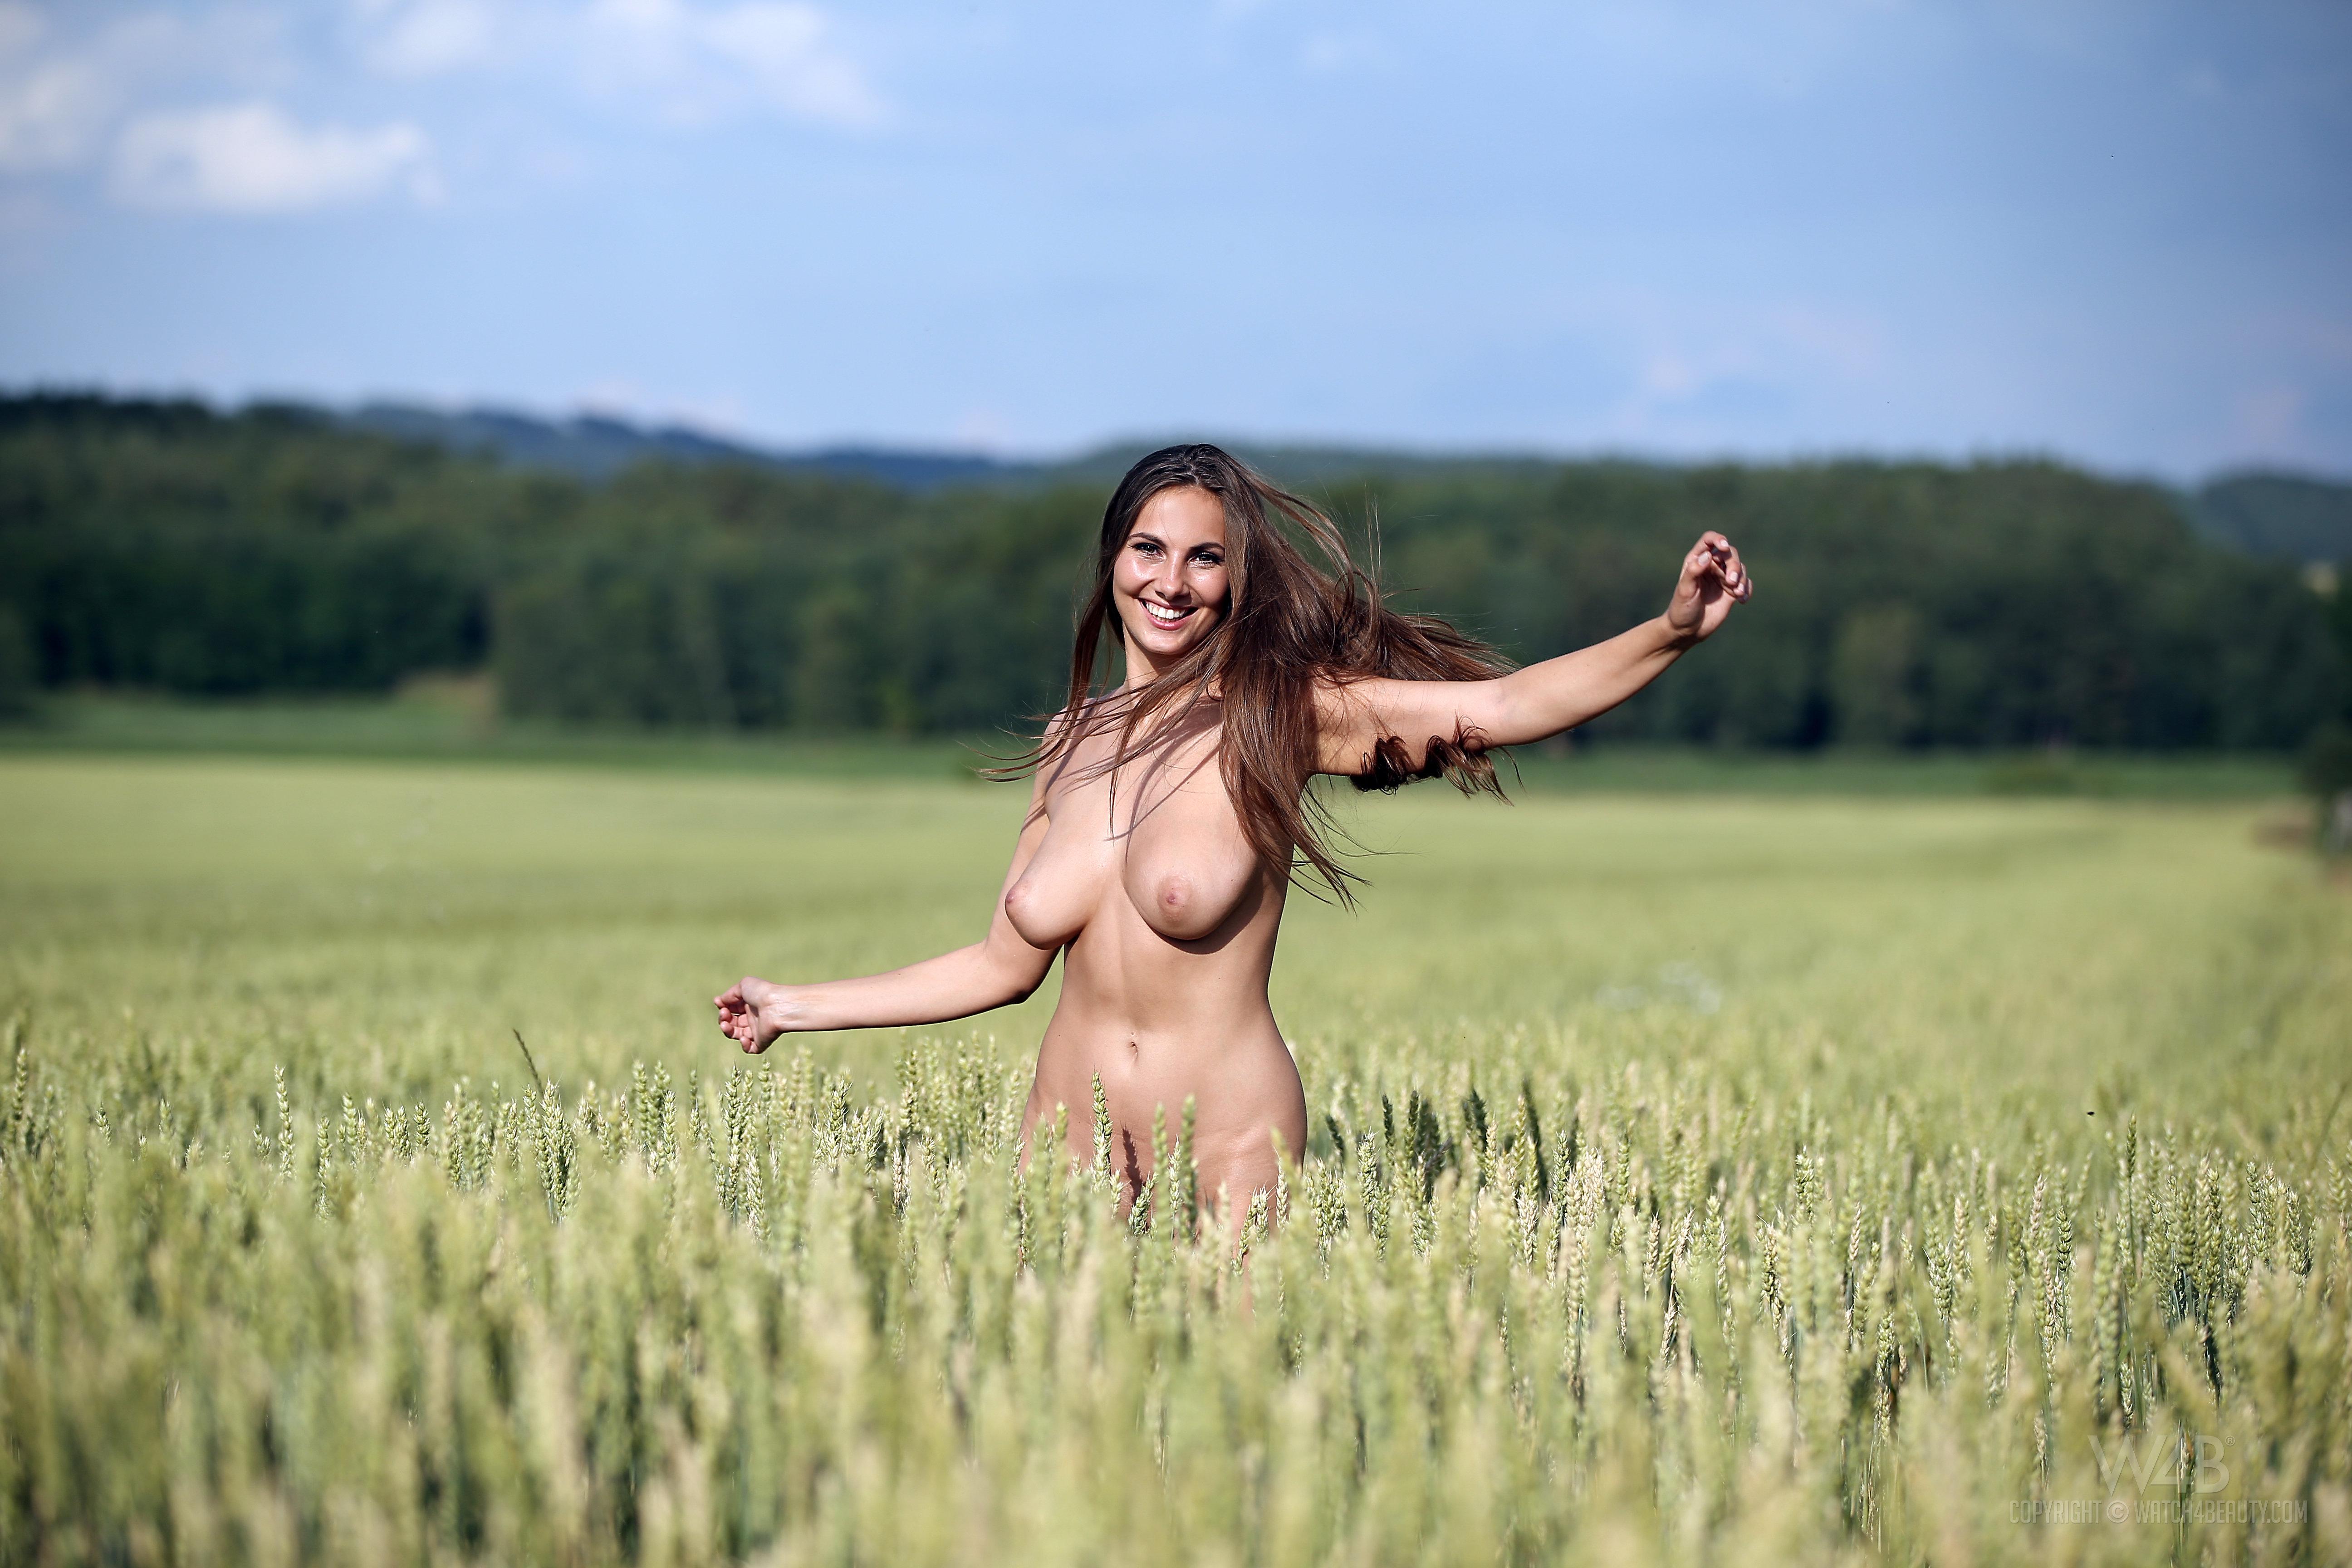 skipping Jumping nude porn woman running